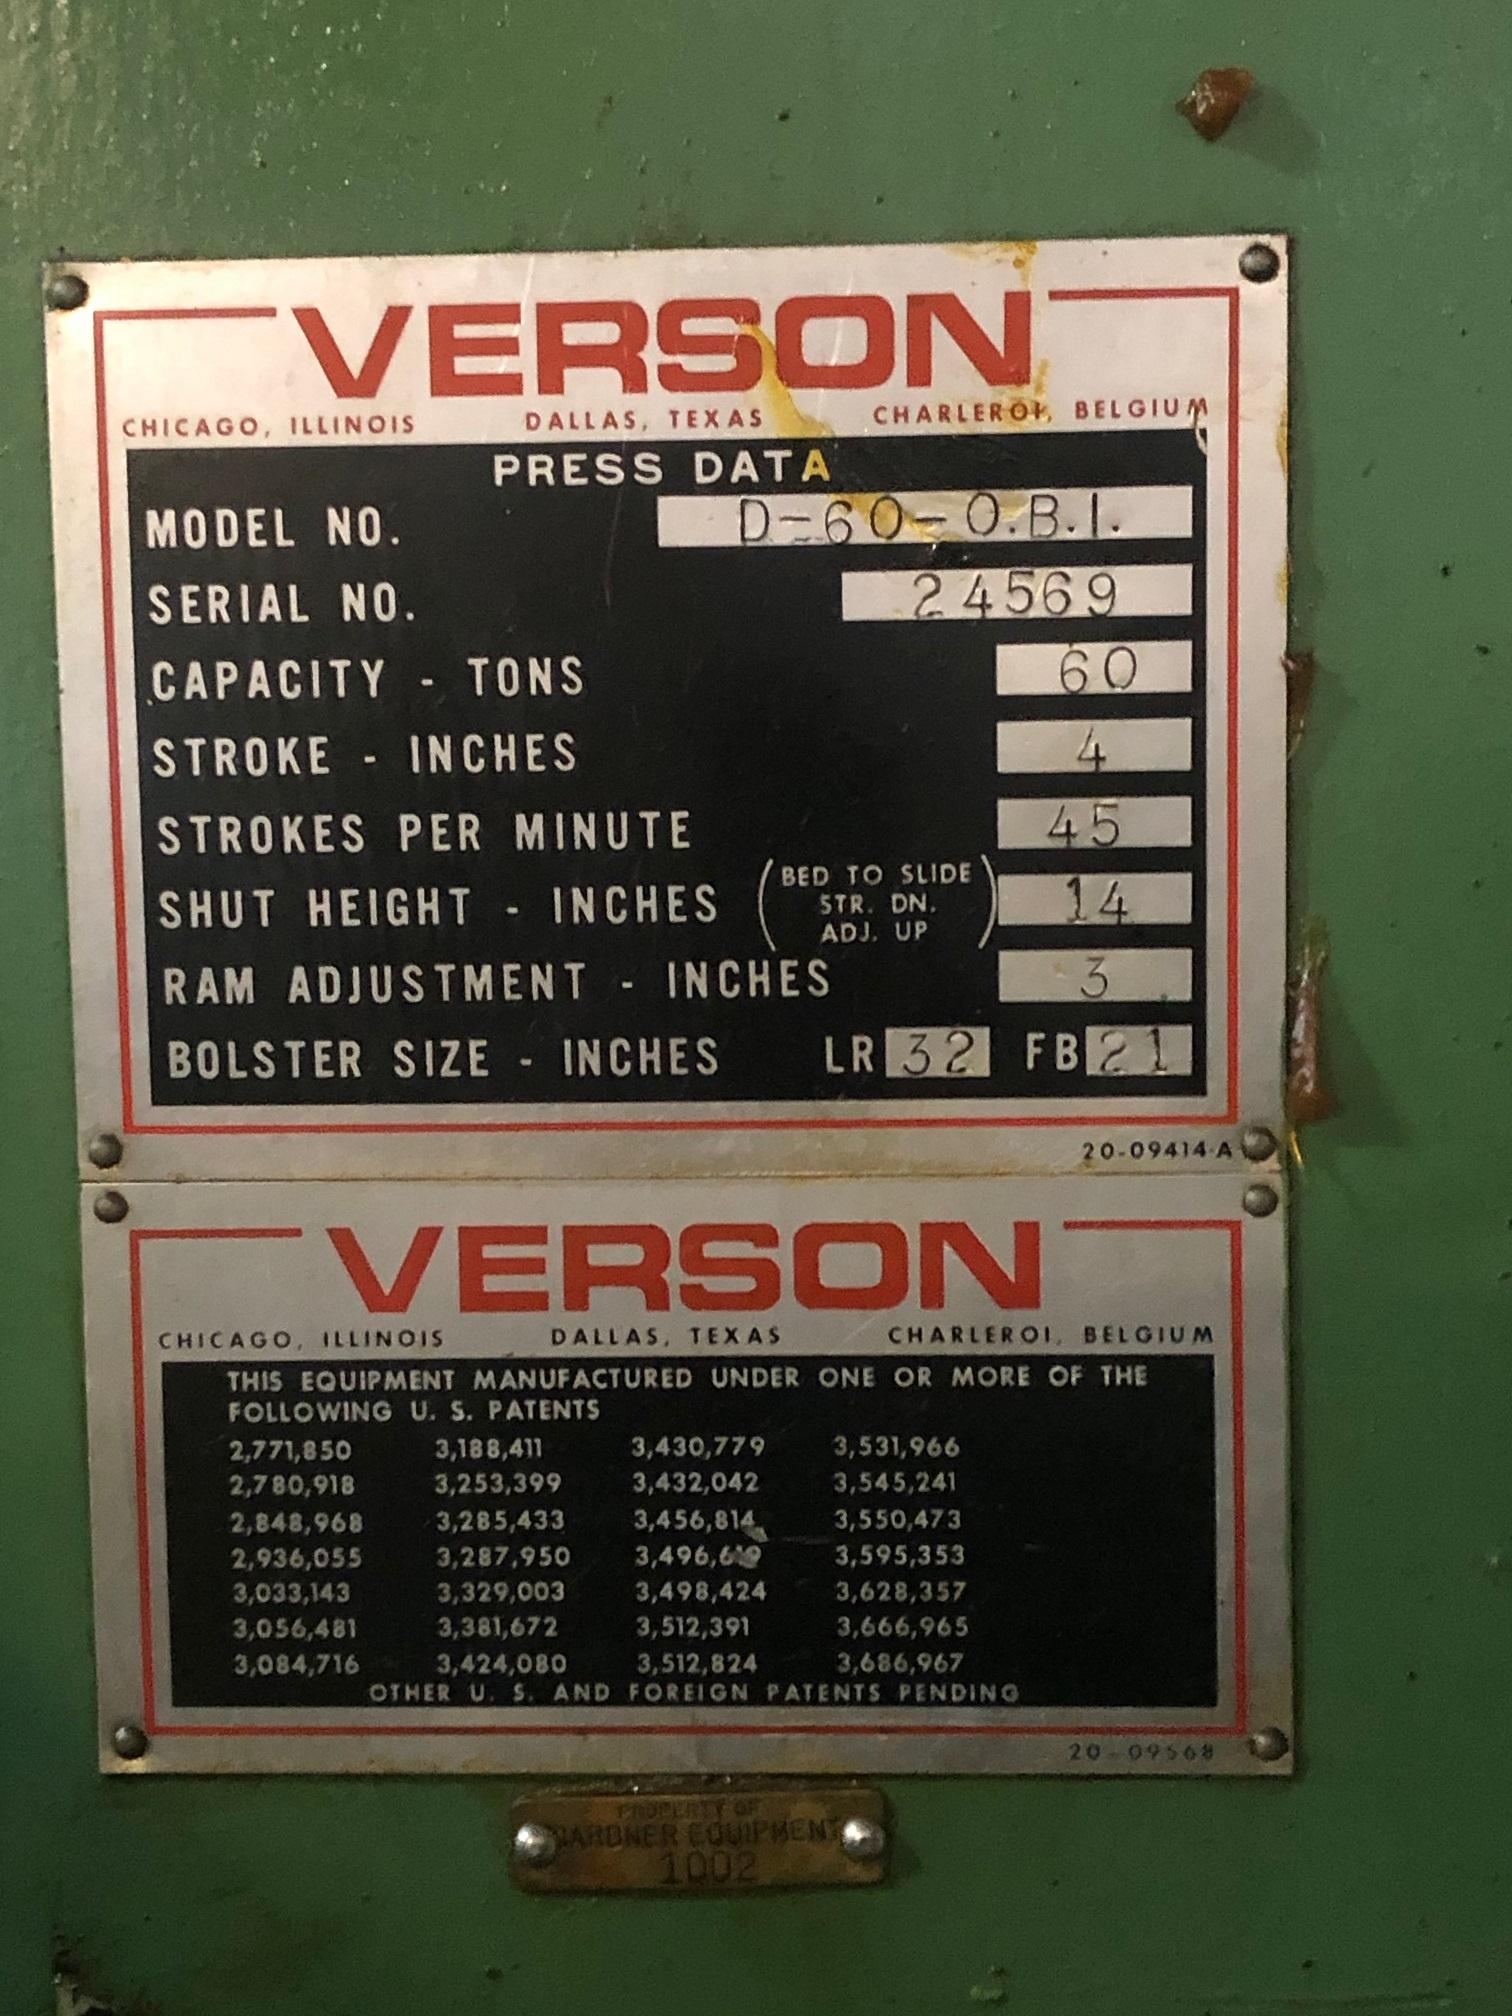 "60 TON VERSON, MODEL D-60, 4"" STROKE, 45 SPM"